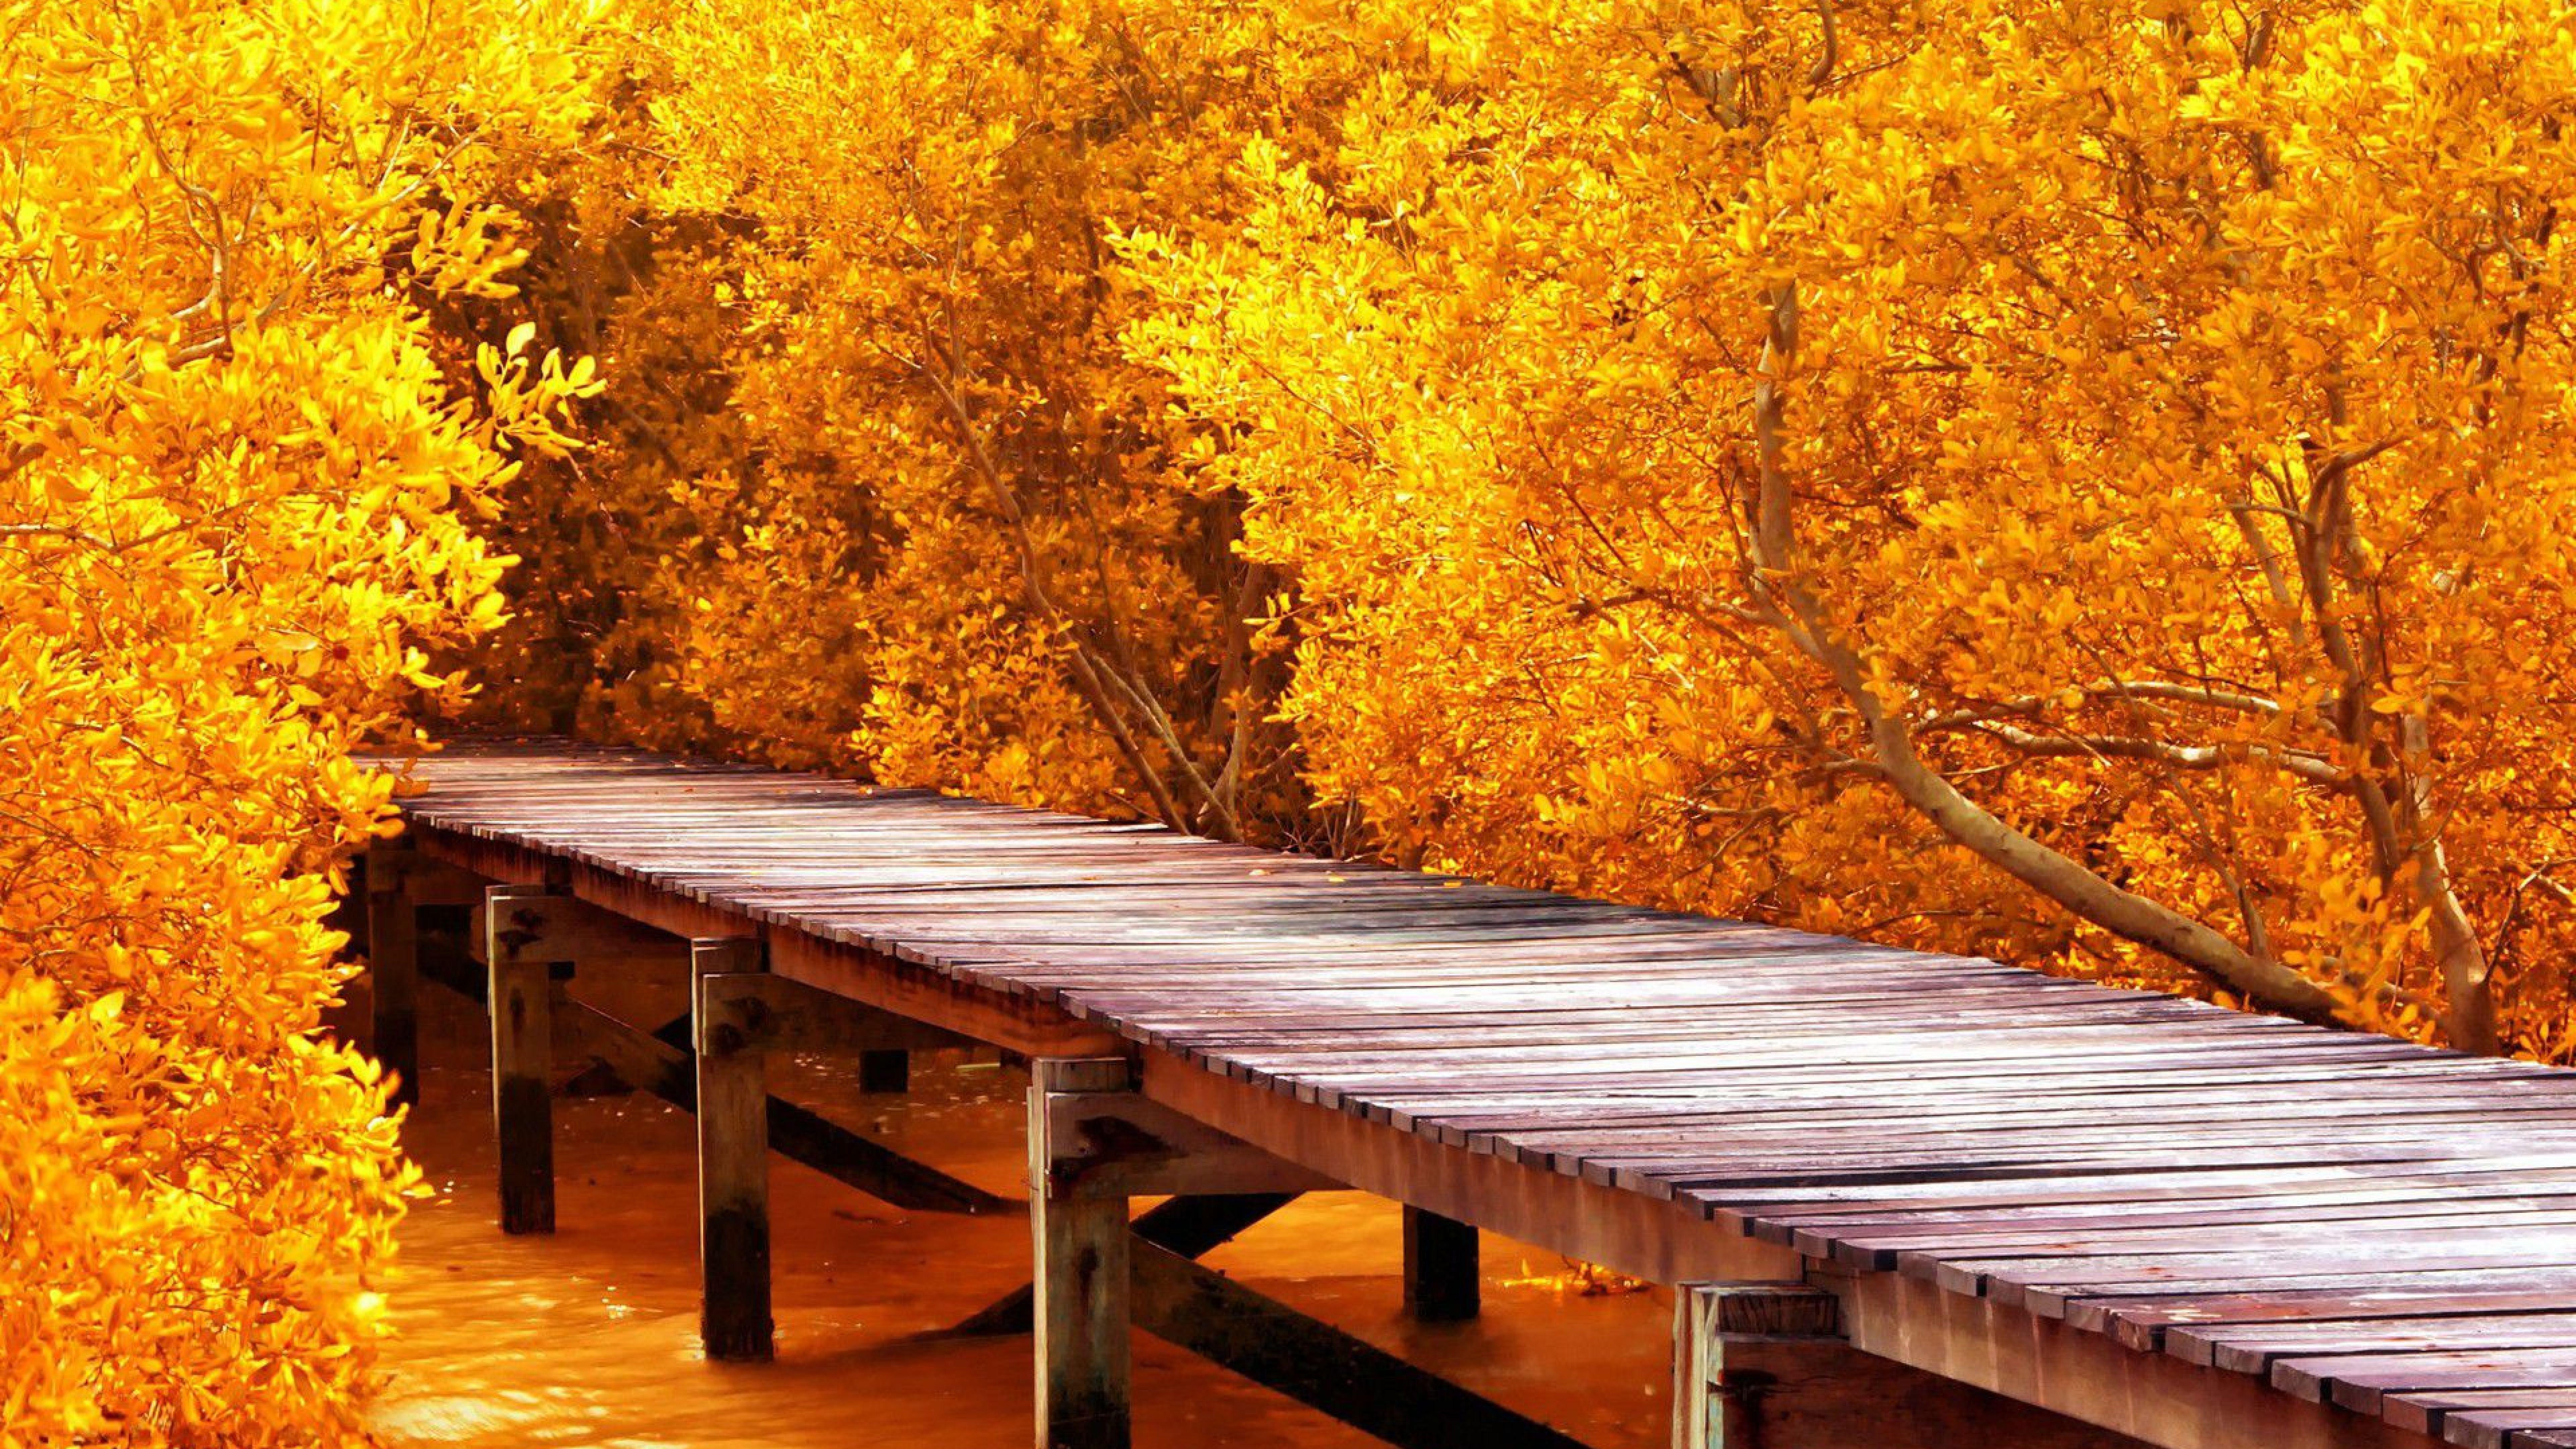 8k Ultra Hd Nature Wallpapers Top Free 8k Ultra Hd Nature